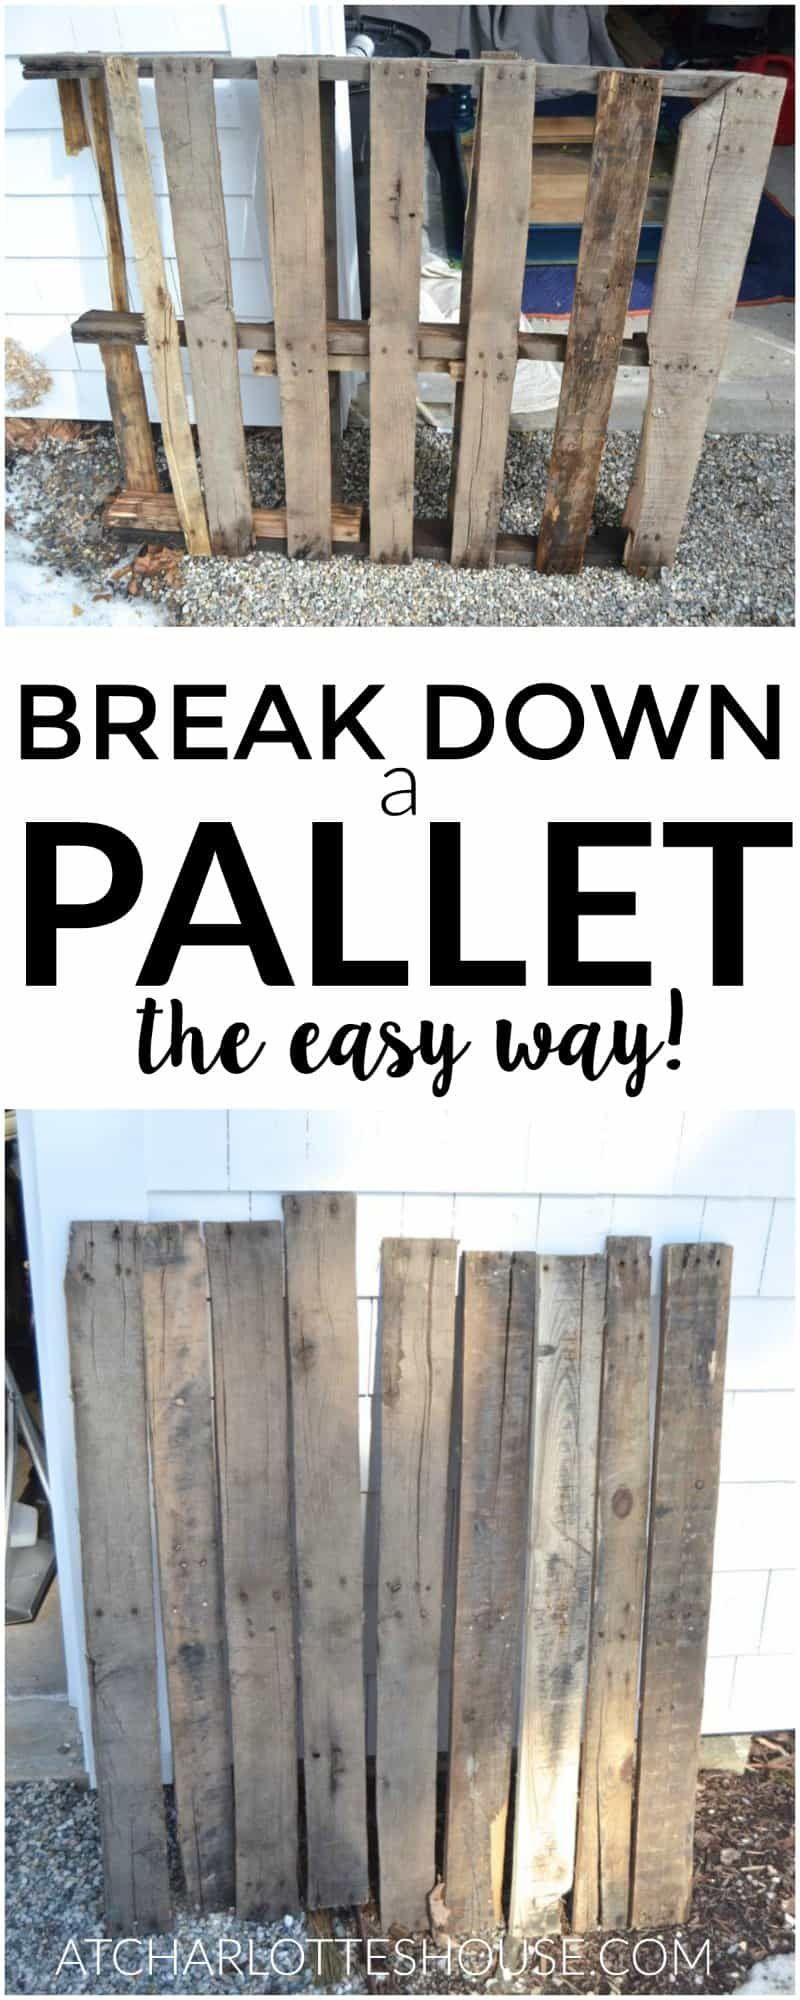 Photo of Pallet Break Down